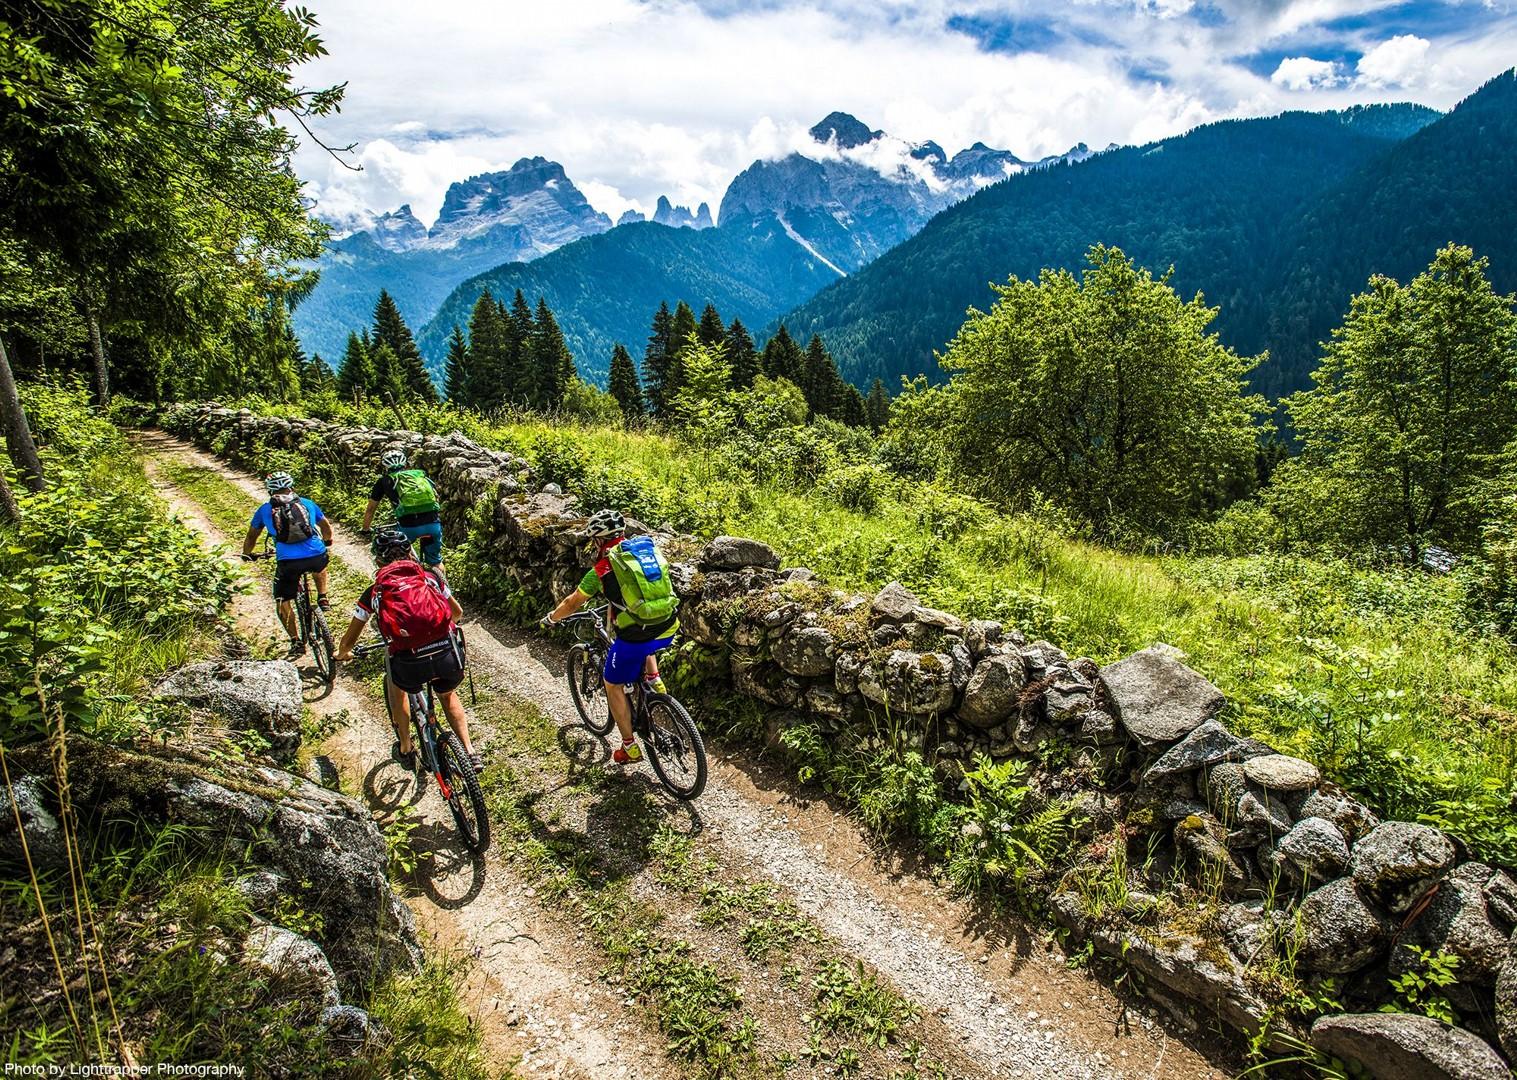 saddle_skedaddle_italy_2017_day6_brenta_dolomites_76-2.jpg - Italy - Dolomites of Brenta - Guided Mountain Bike Holiday - Mountain Biking